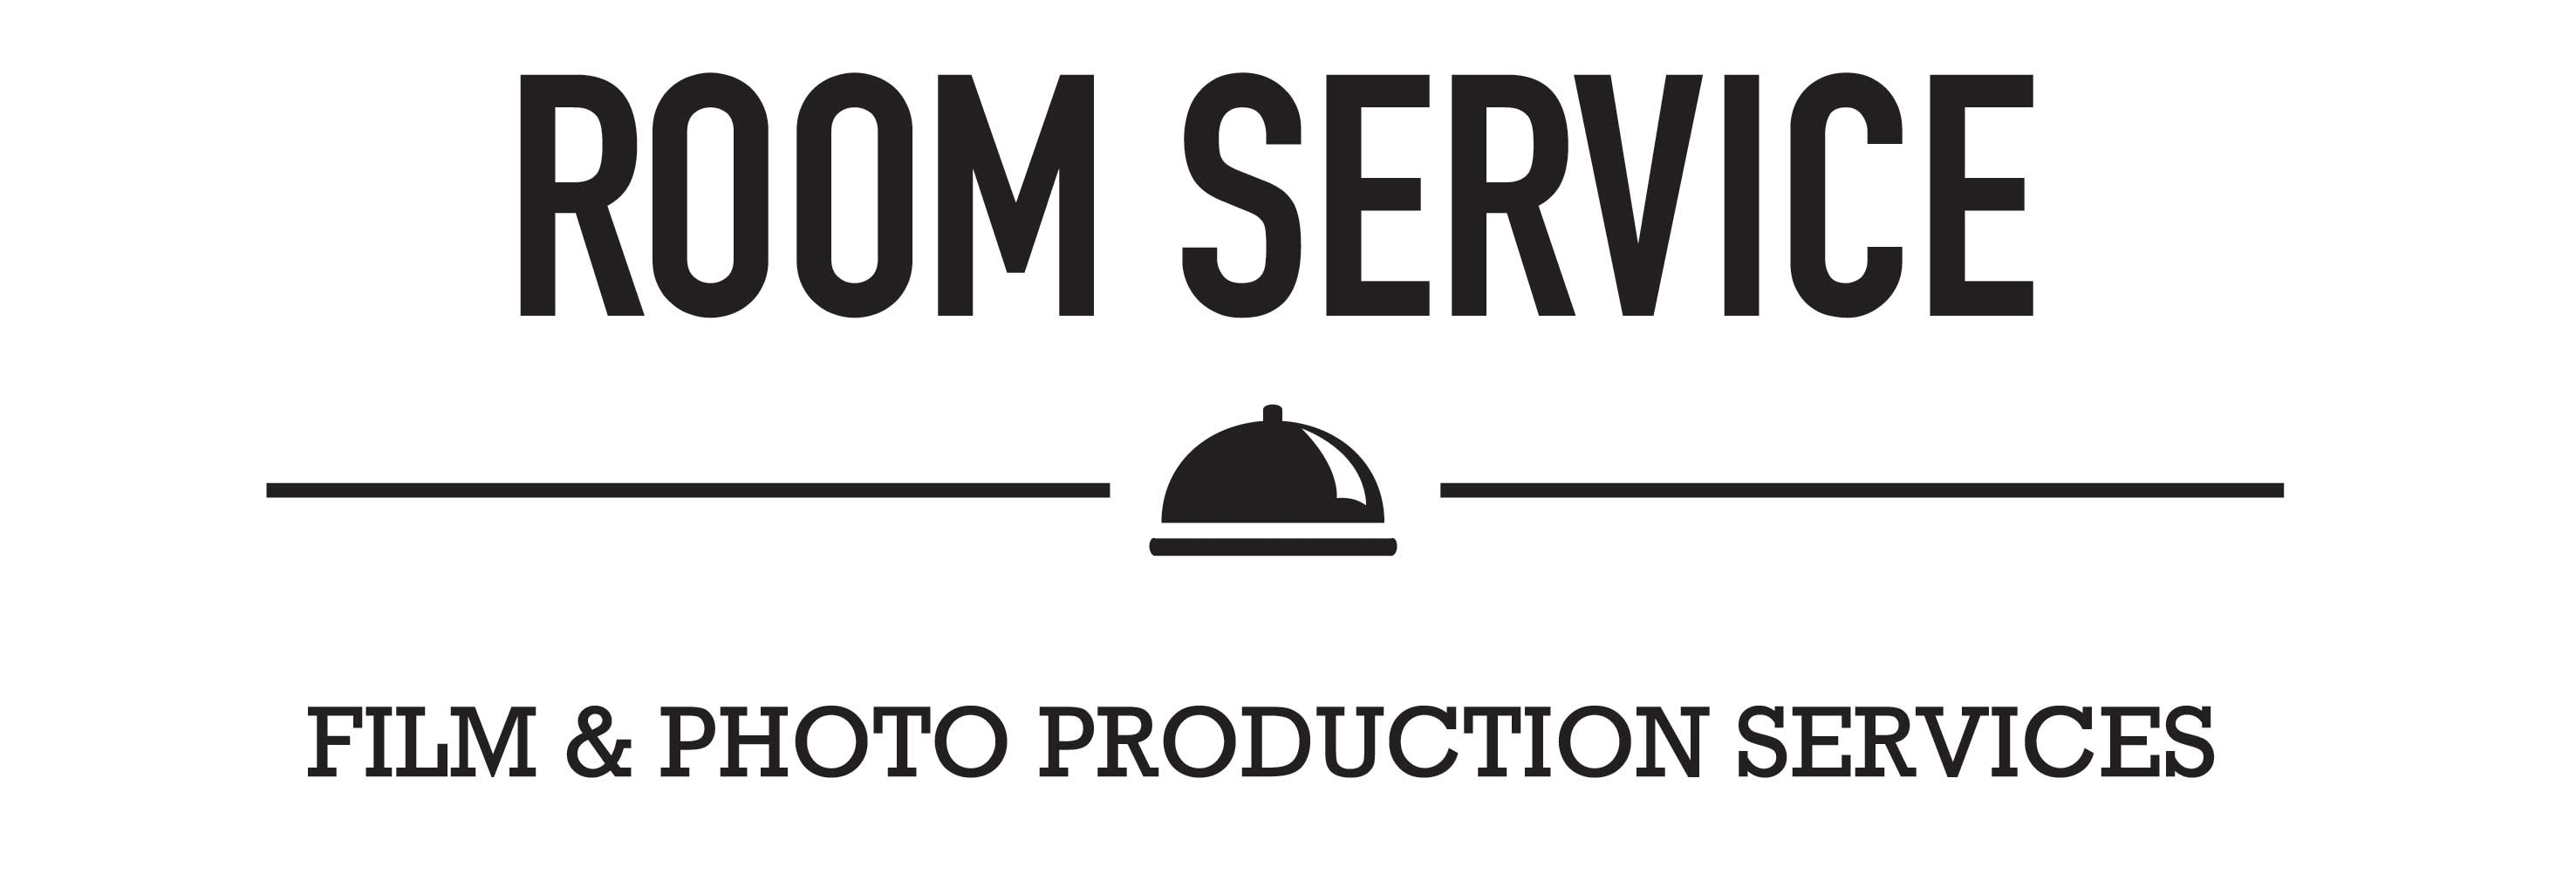 logo Room Service